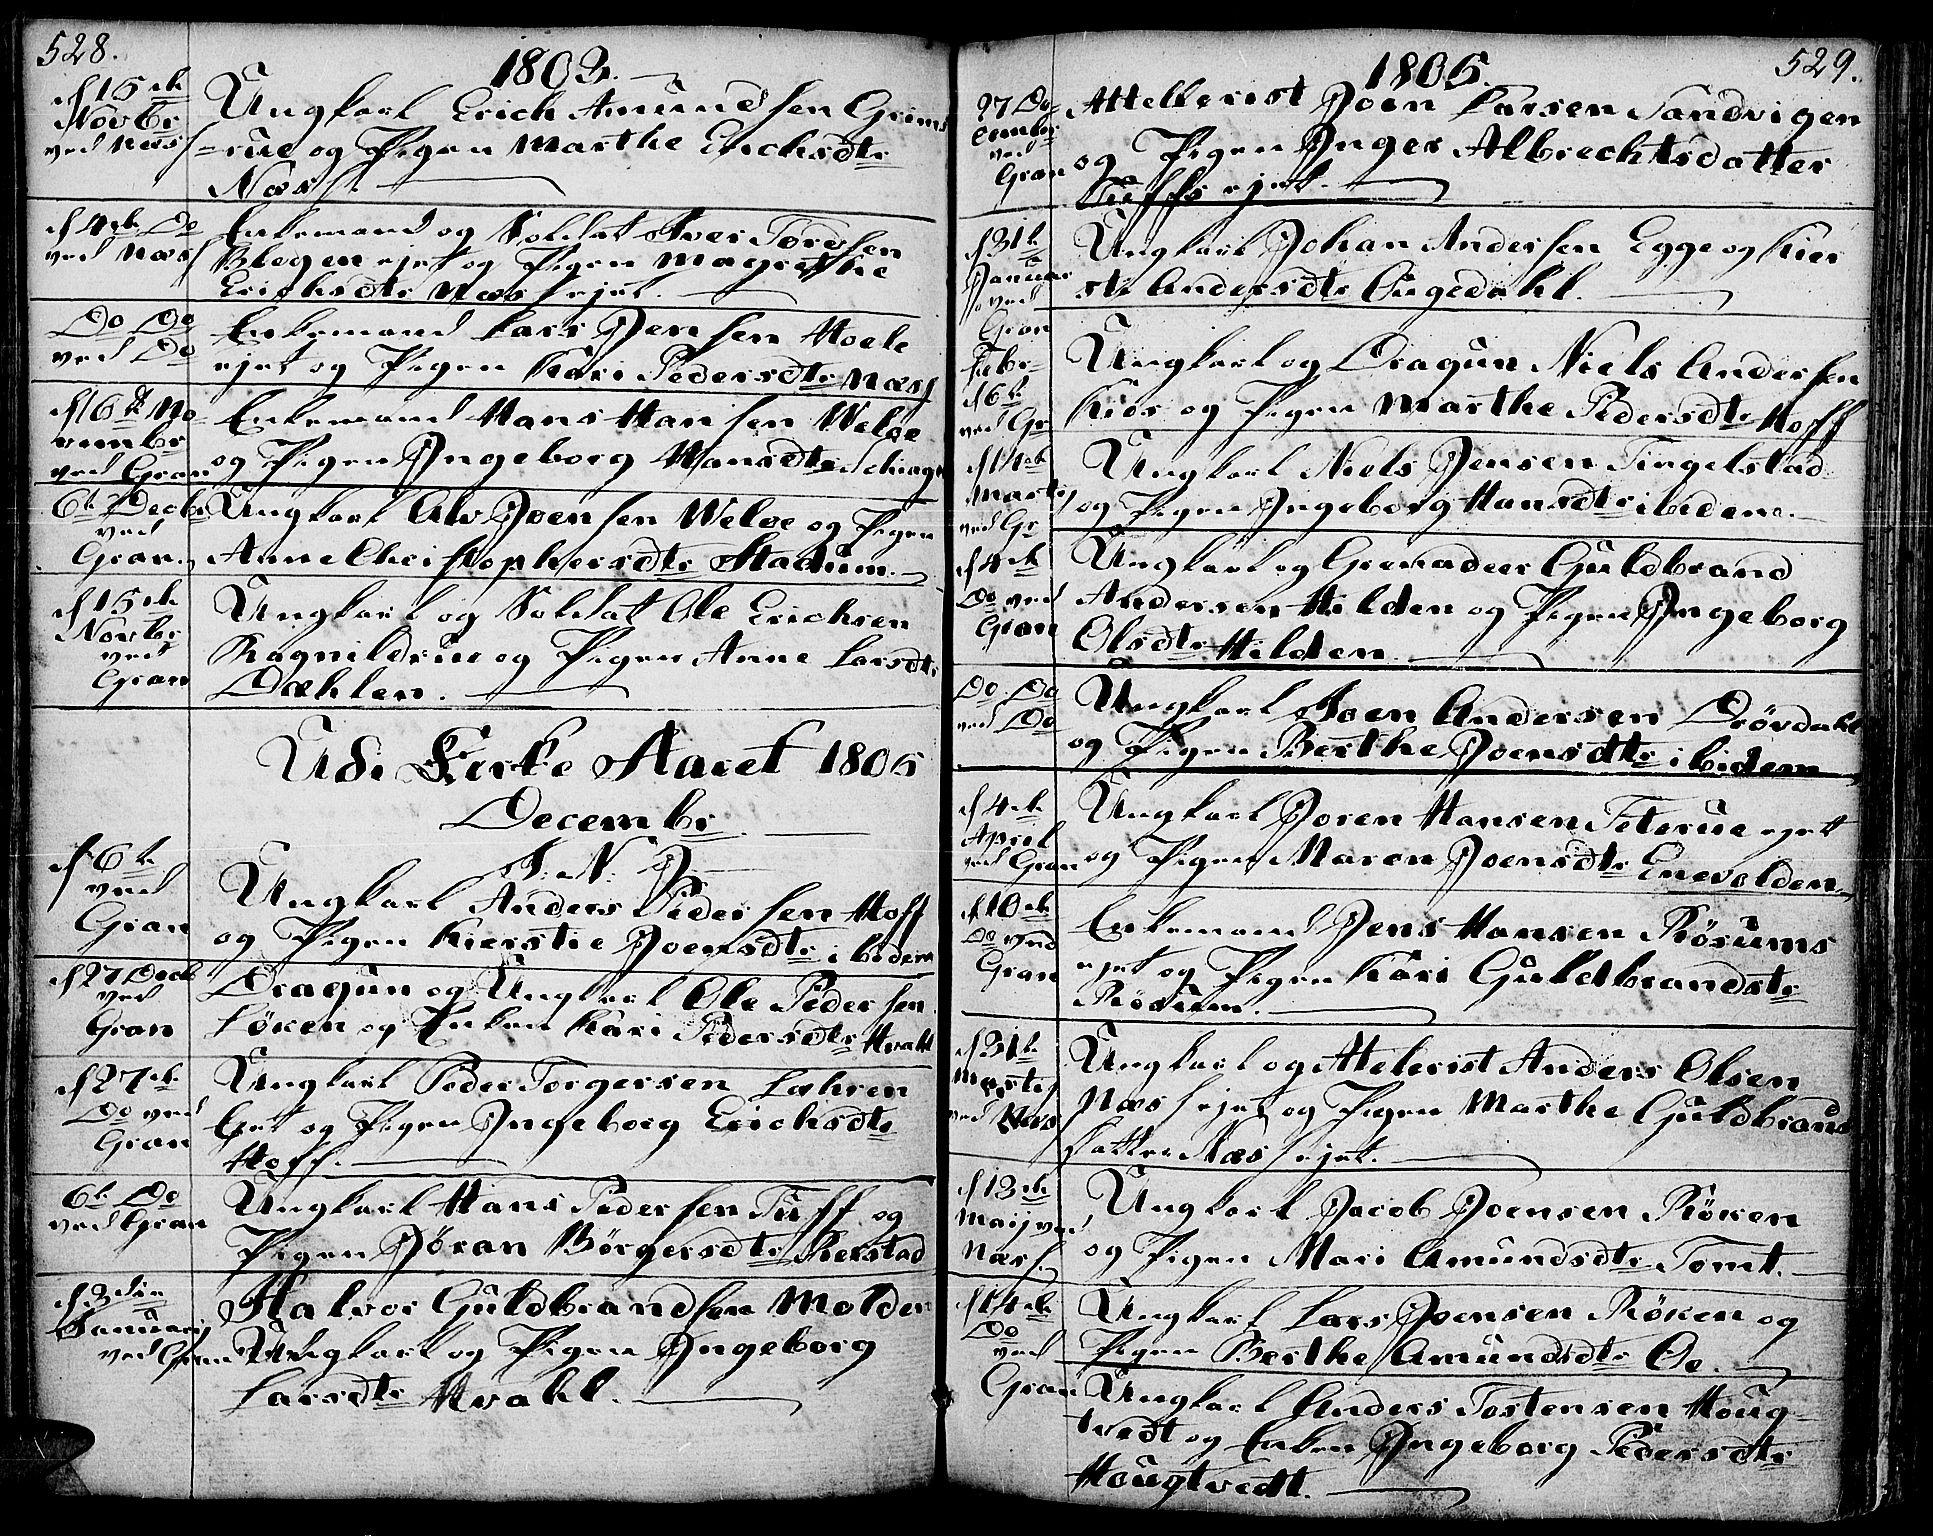 SAH, Gran prestekontor, Ministerialbok nr. 6, 1787-1824, s. 528-529